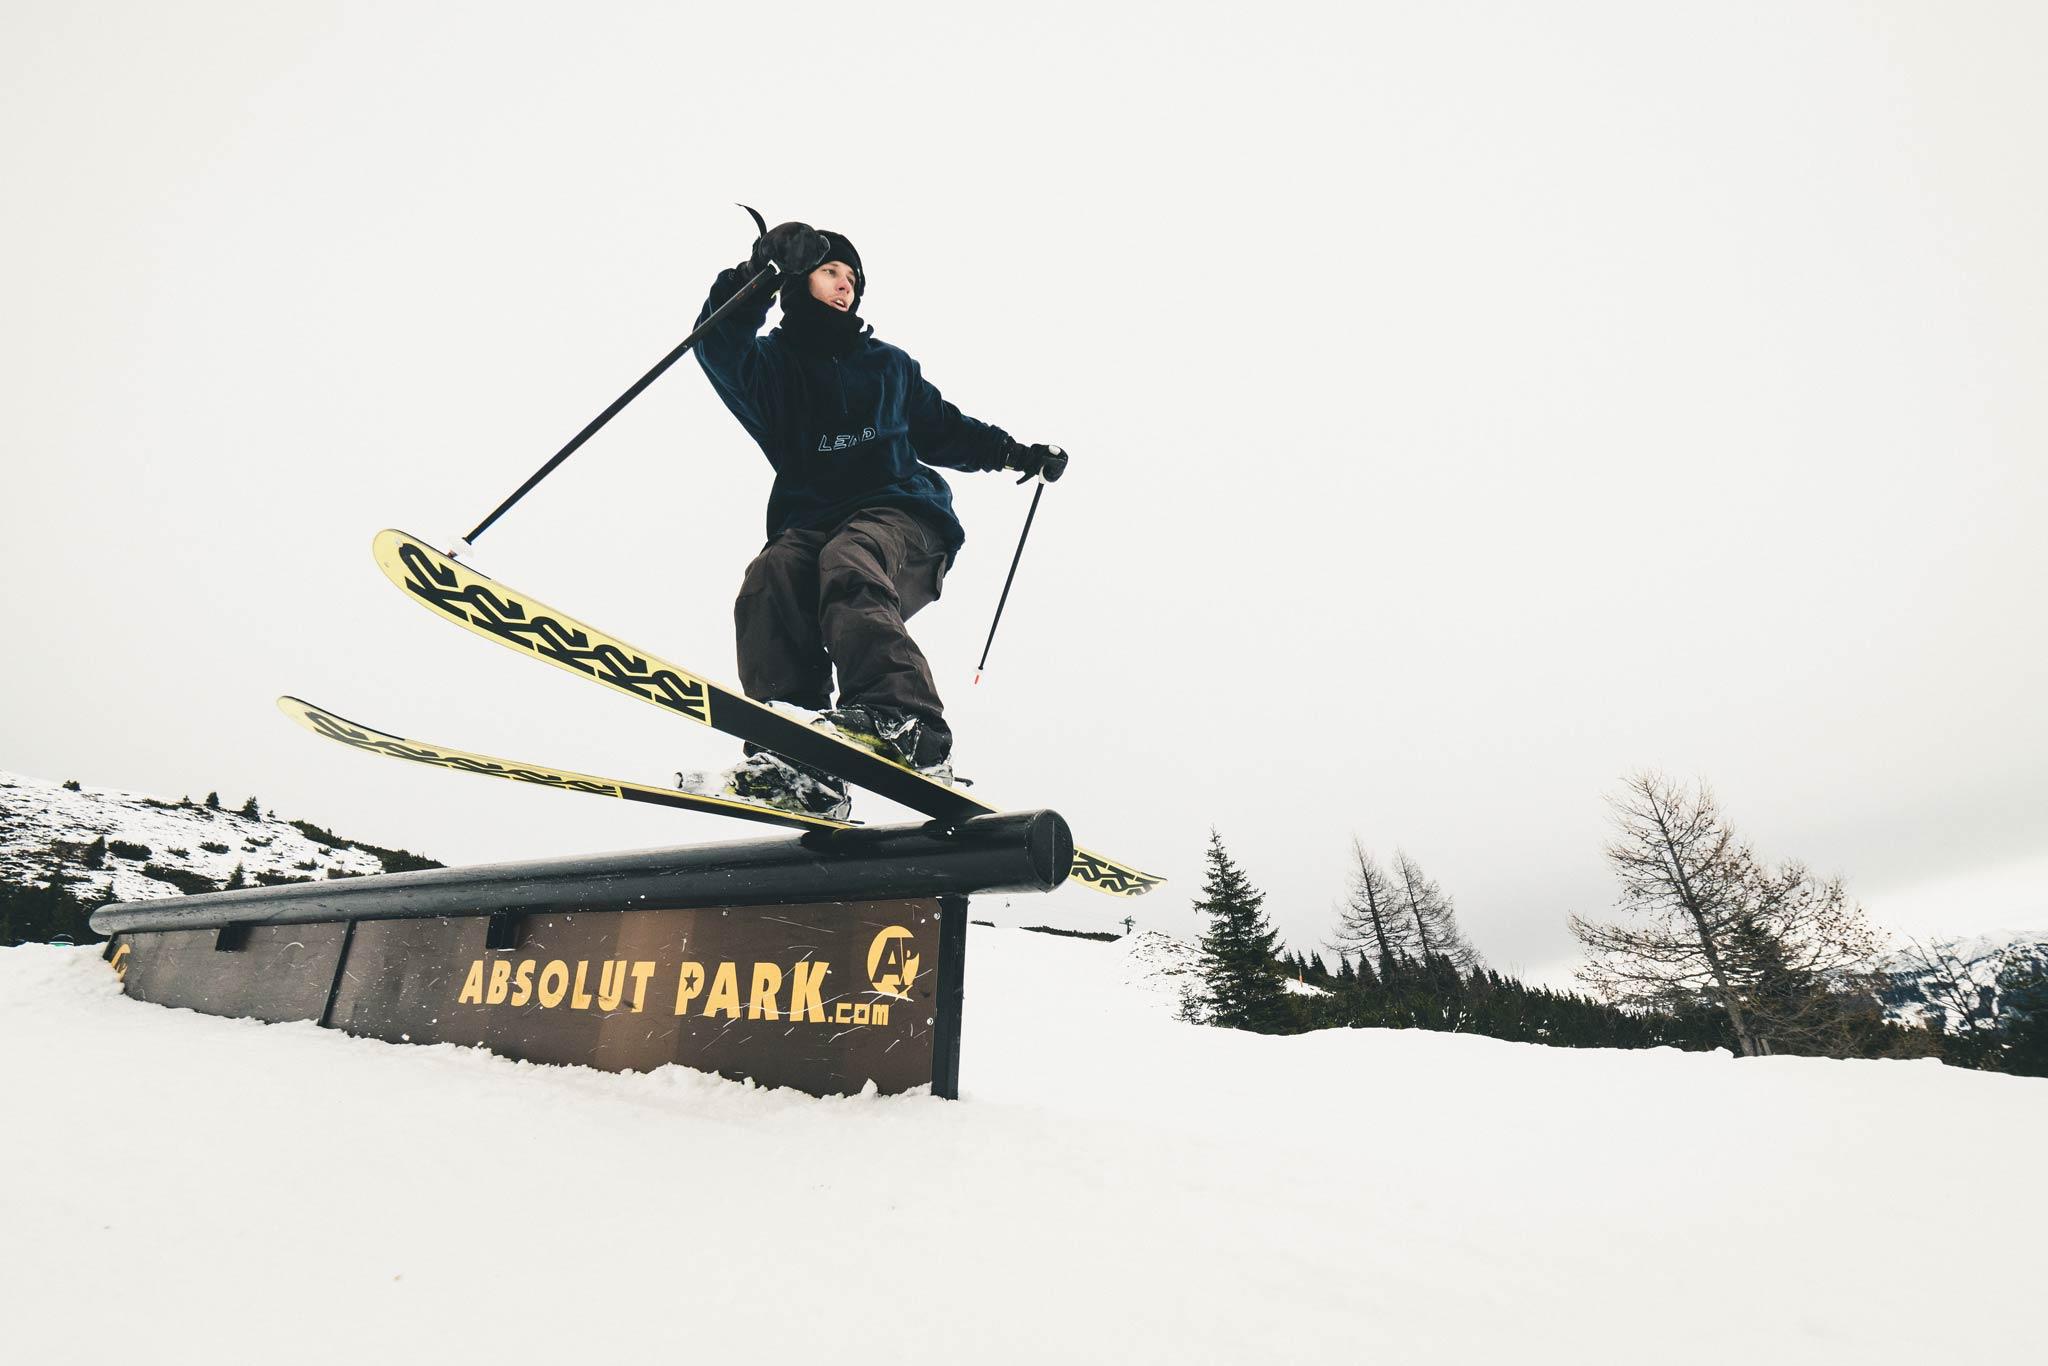 Spot: Absolut Park Flachauwinkl - Foto: Jürgen Nigg